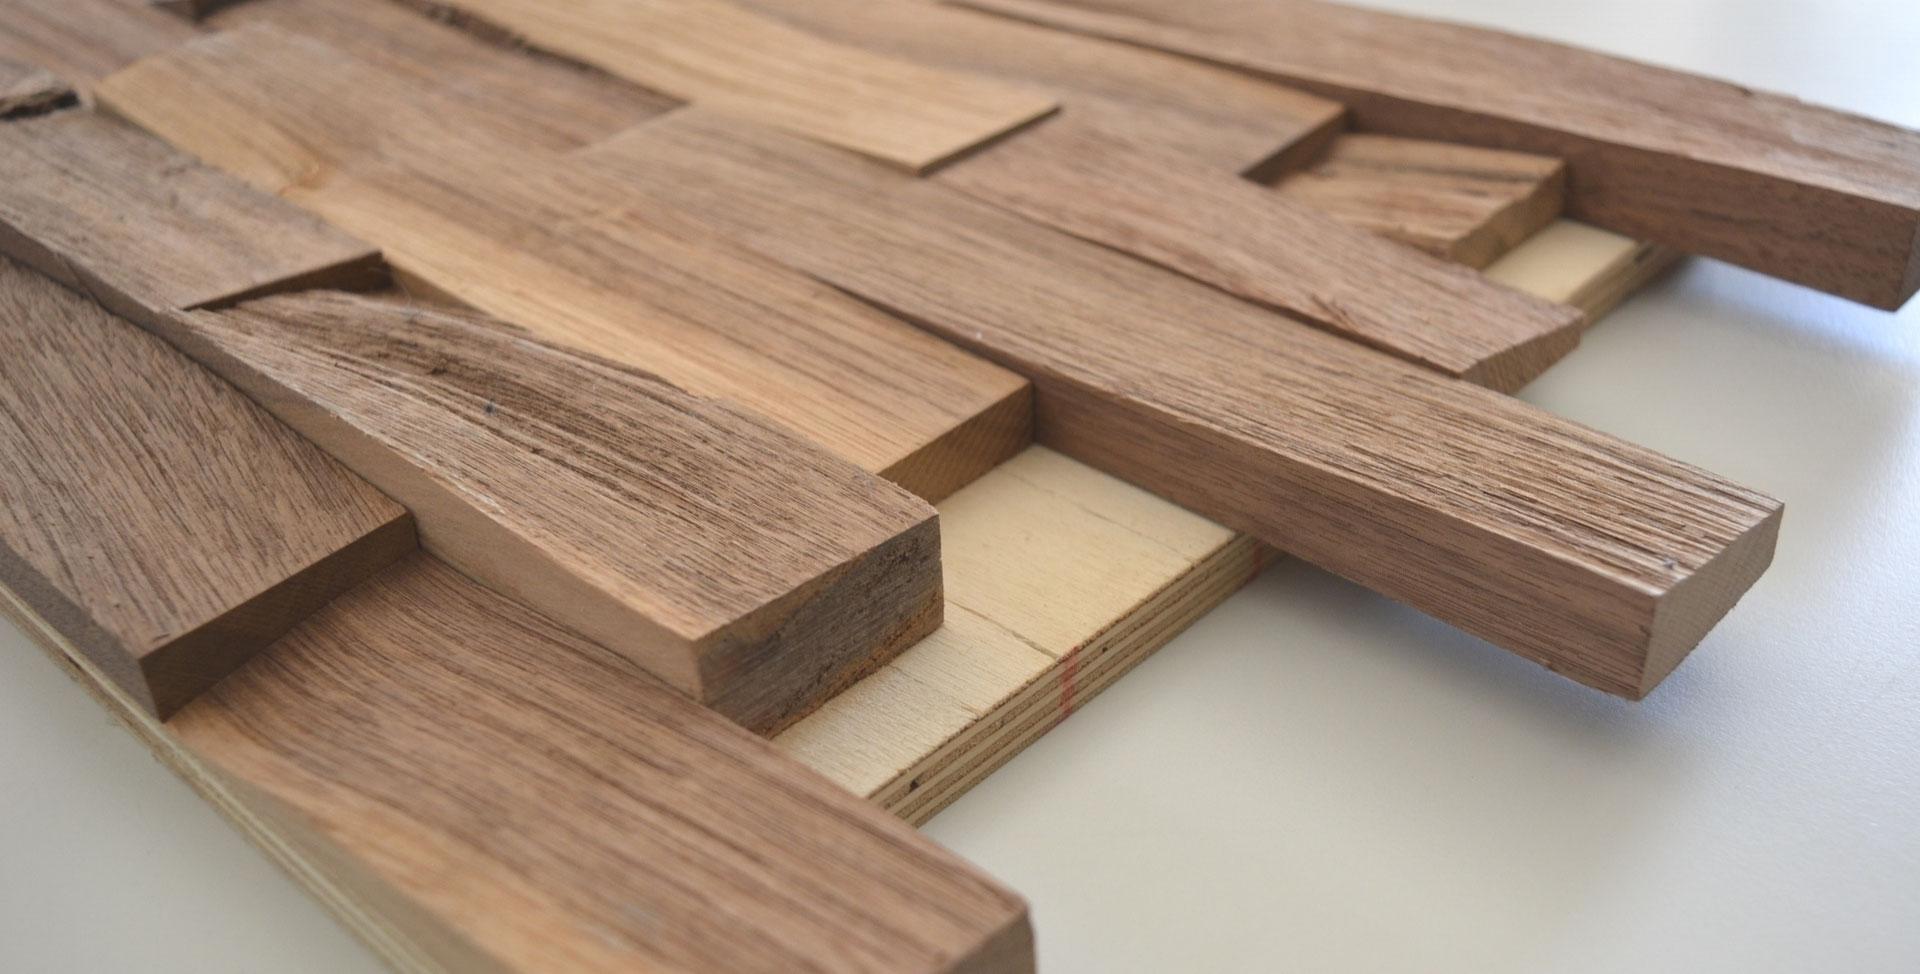 Top Massivholz auf Trägerplatte - Wandverkleidung aus Holz WJ11